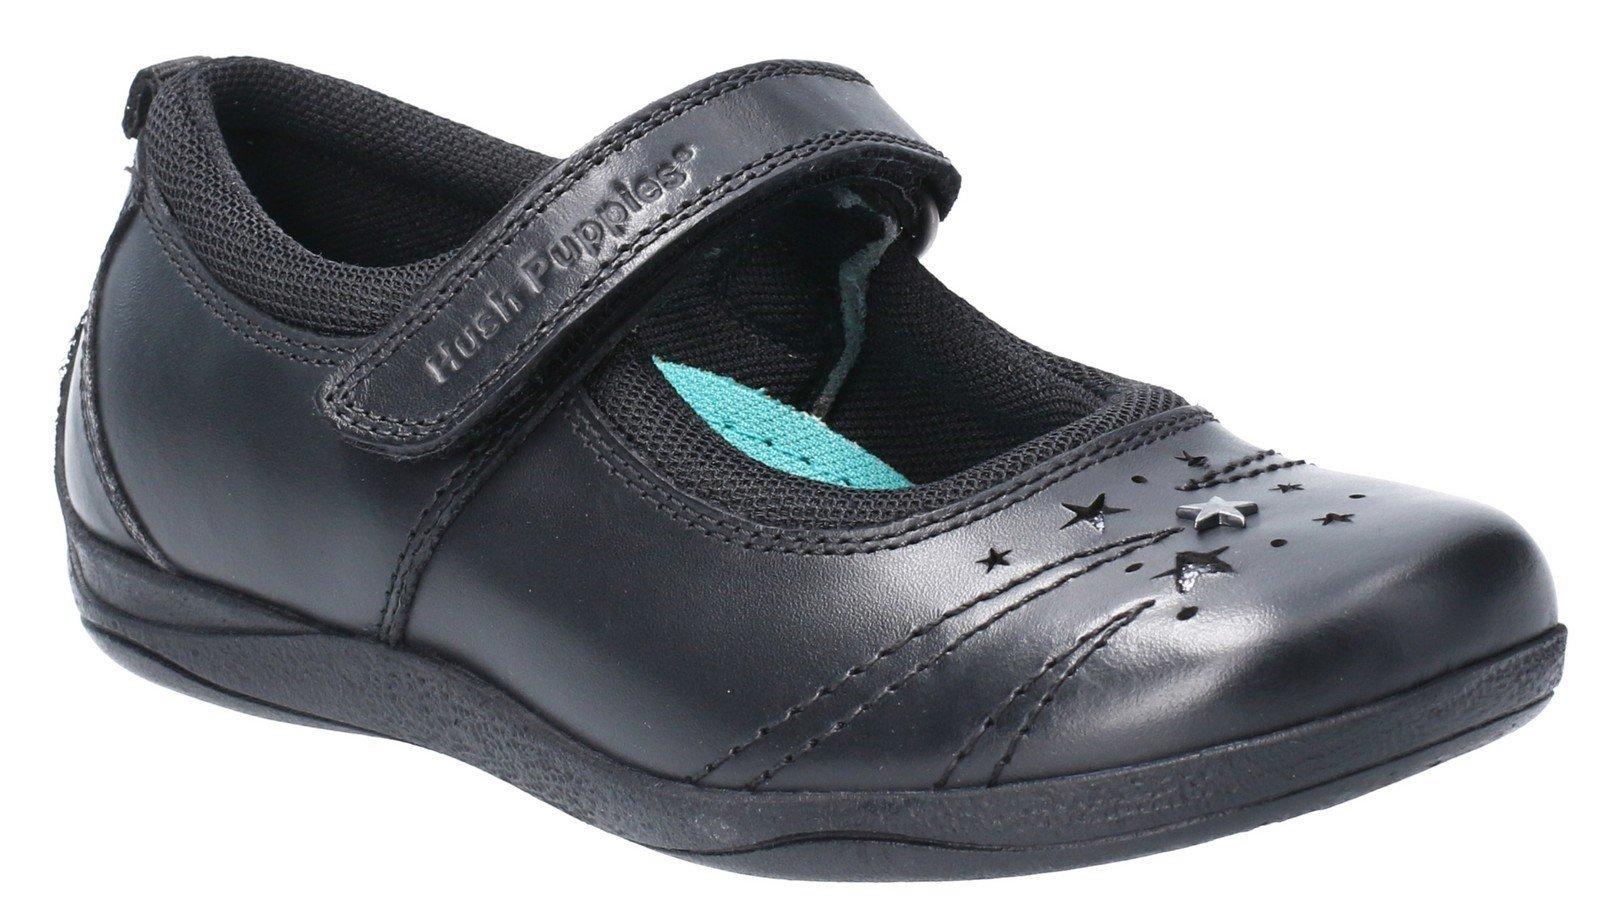 Hush Puppies Kid's Amber Jnr Touch Fastening School Shoe Black 28979 - Black 13.5 UK